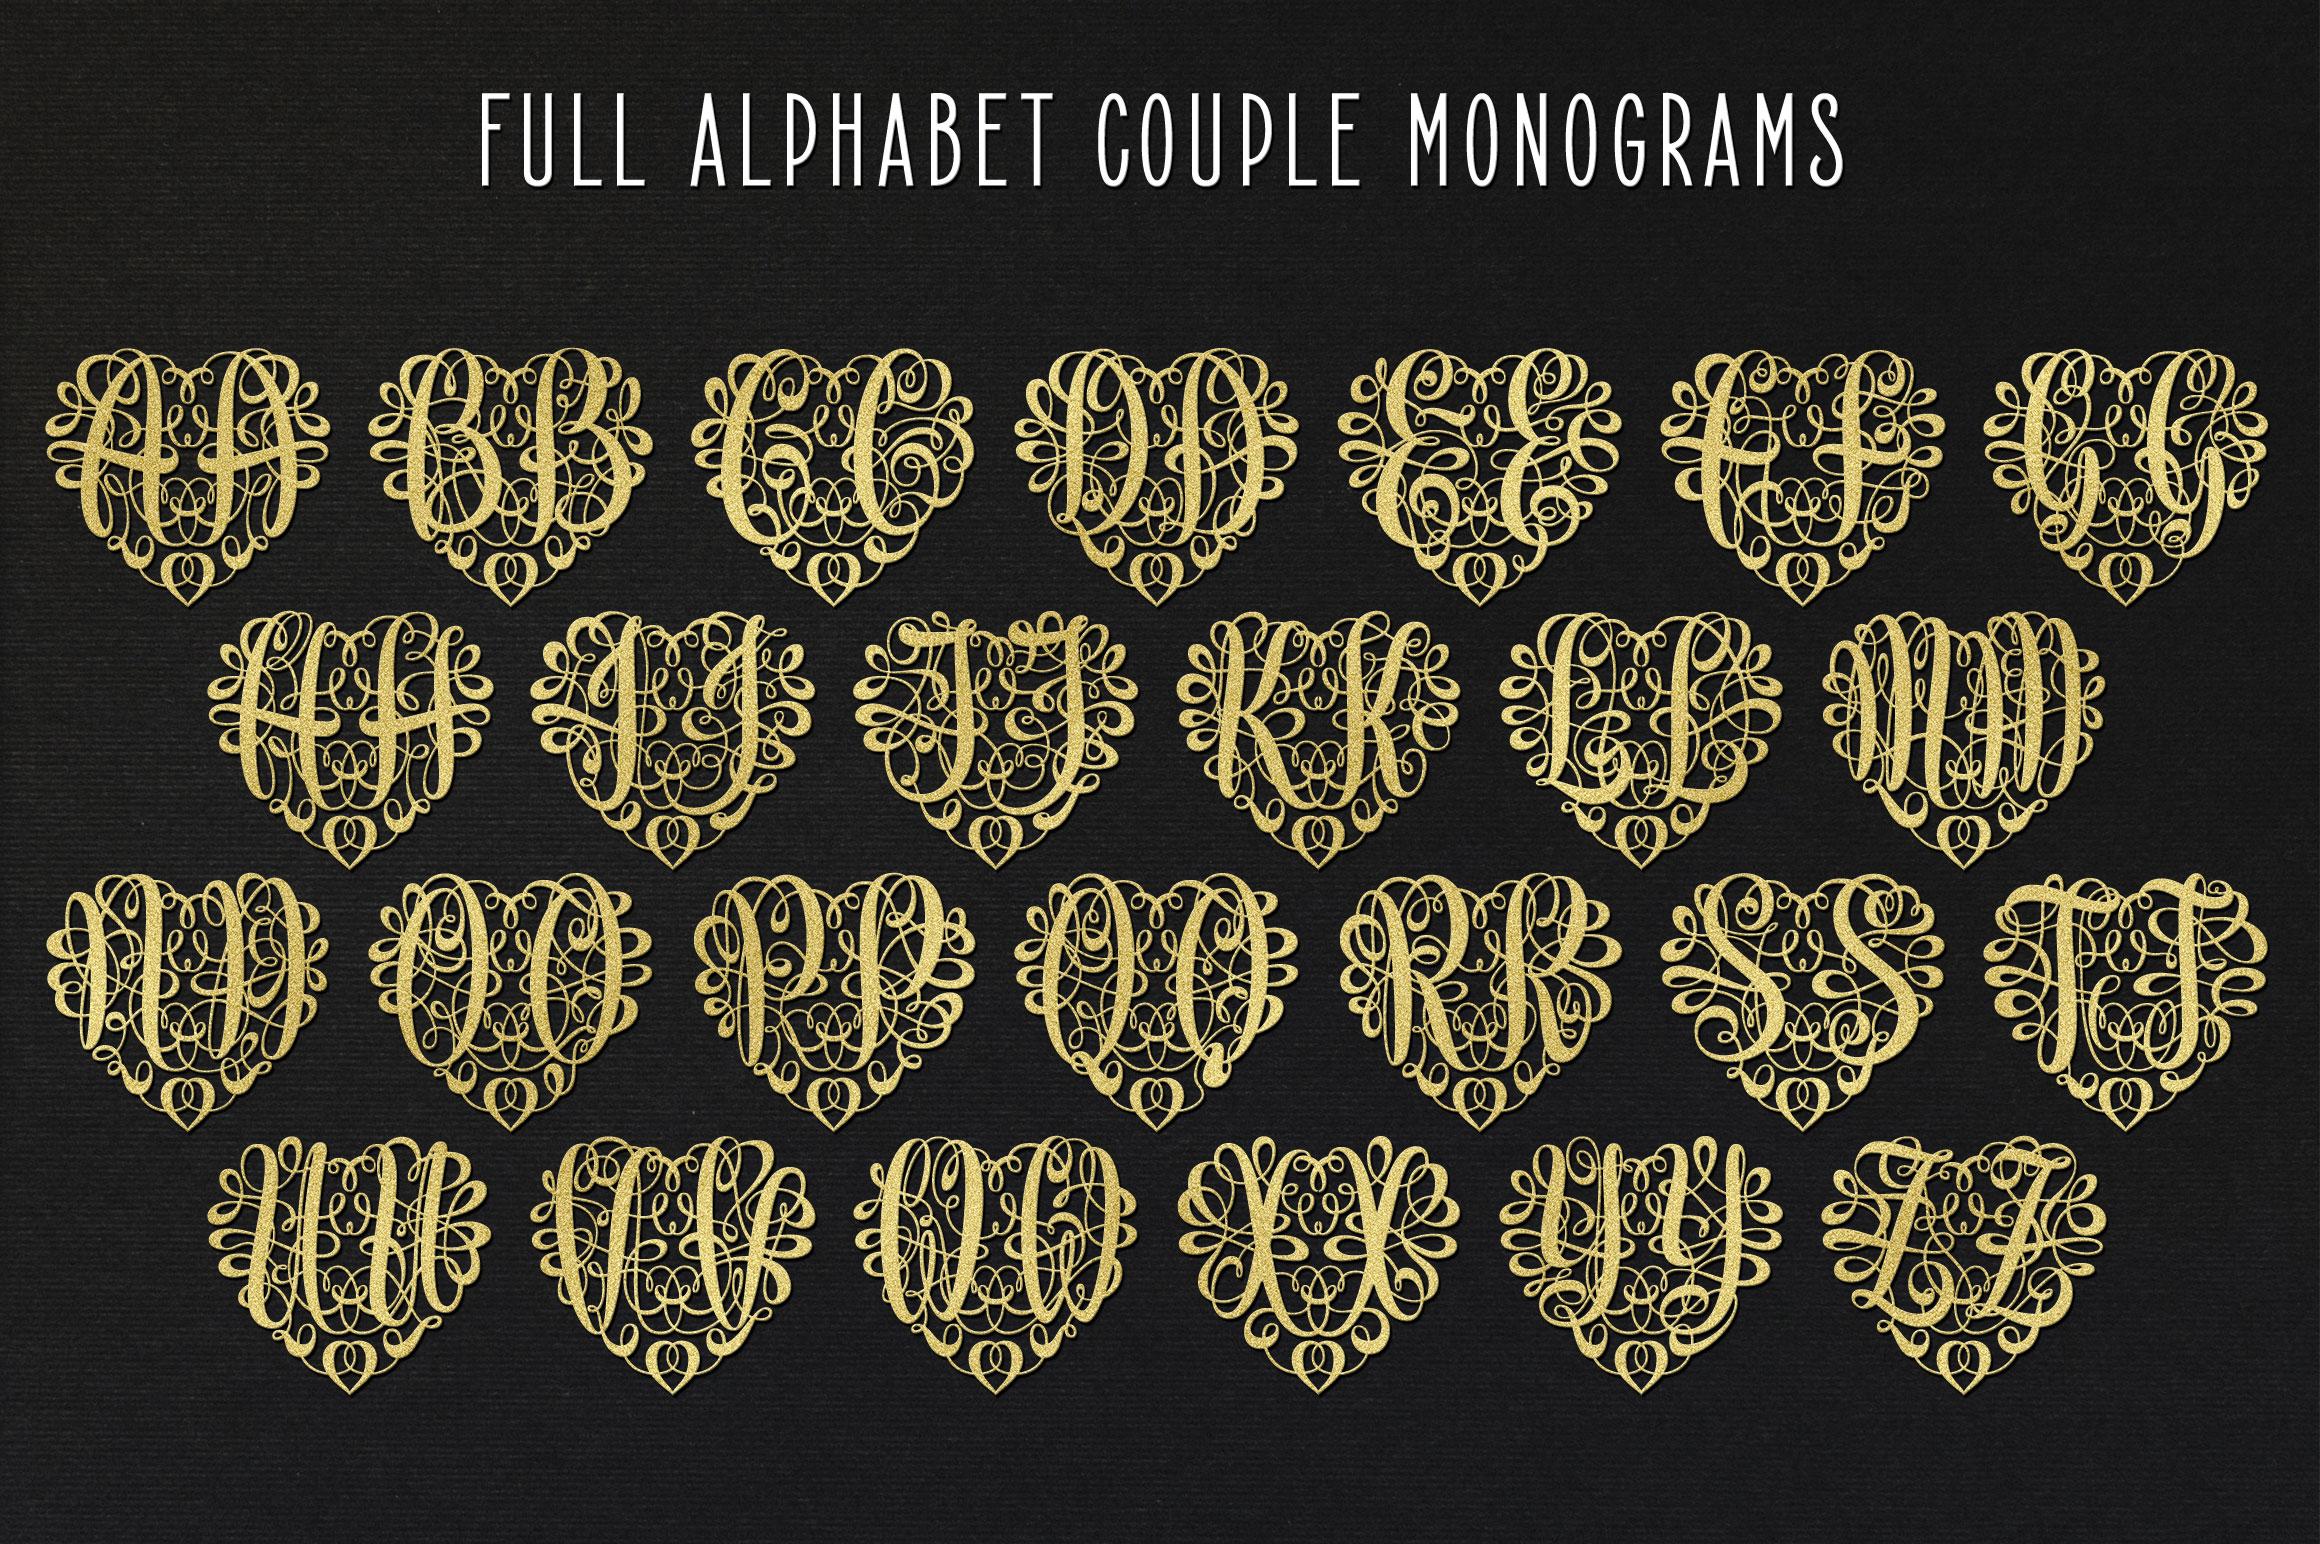 Monogram Script | Full Alphabet Single & Couple Monograms example image 7